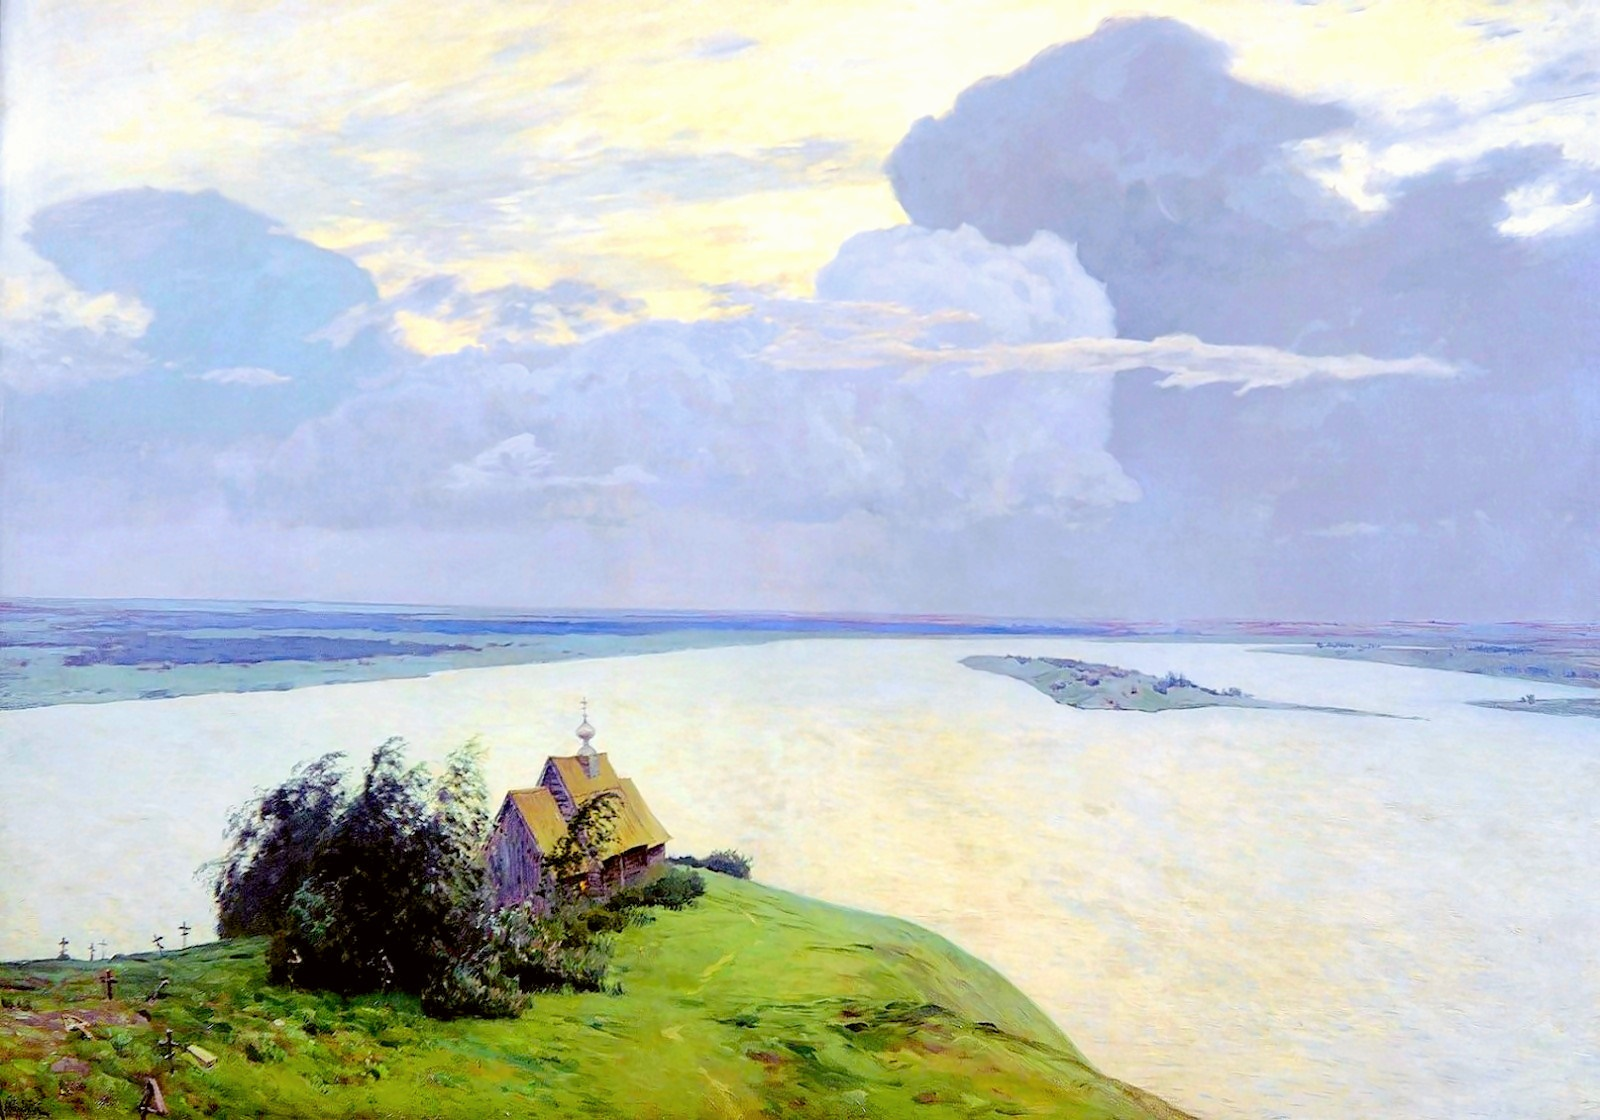 00 Isaak Levitan. Eternal Peace. 1894